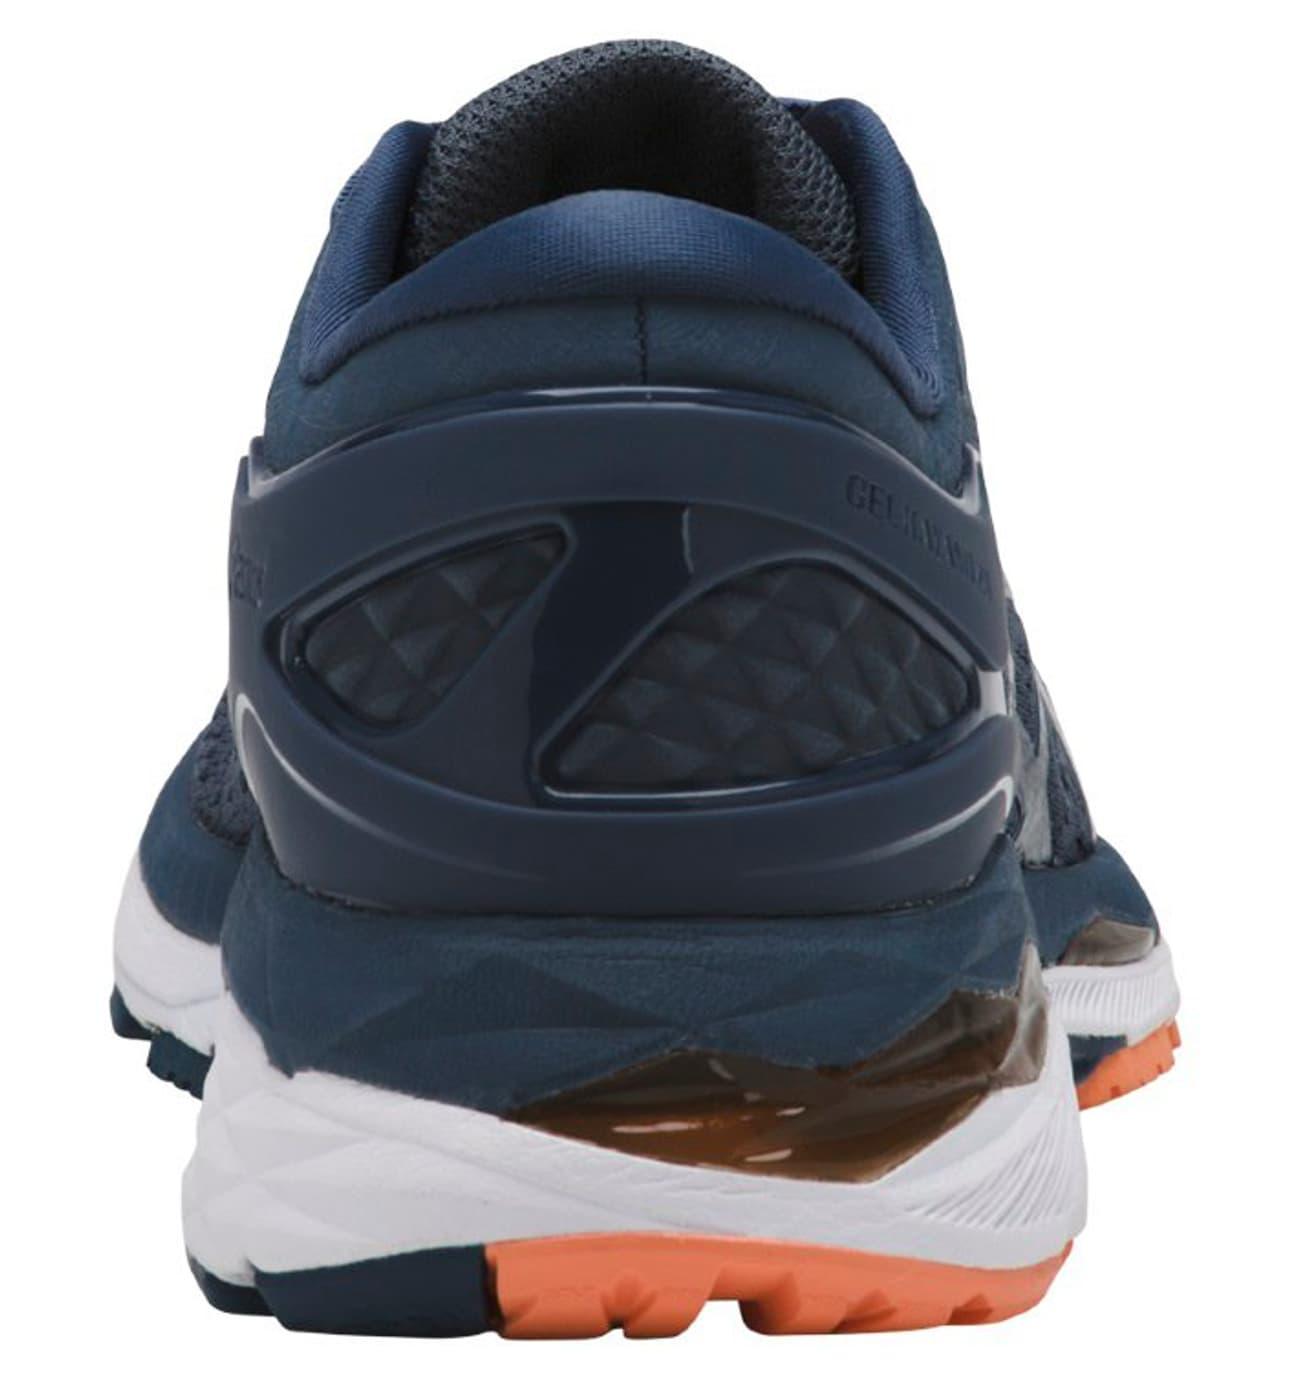 24 pour de course Kayano Gel Chaussures Asics femmeMigros OXiPkuZT